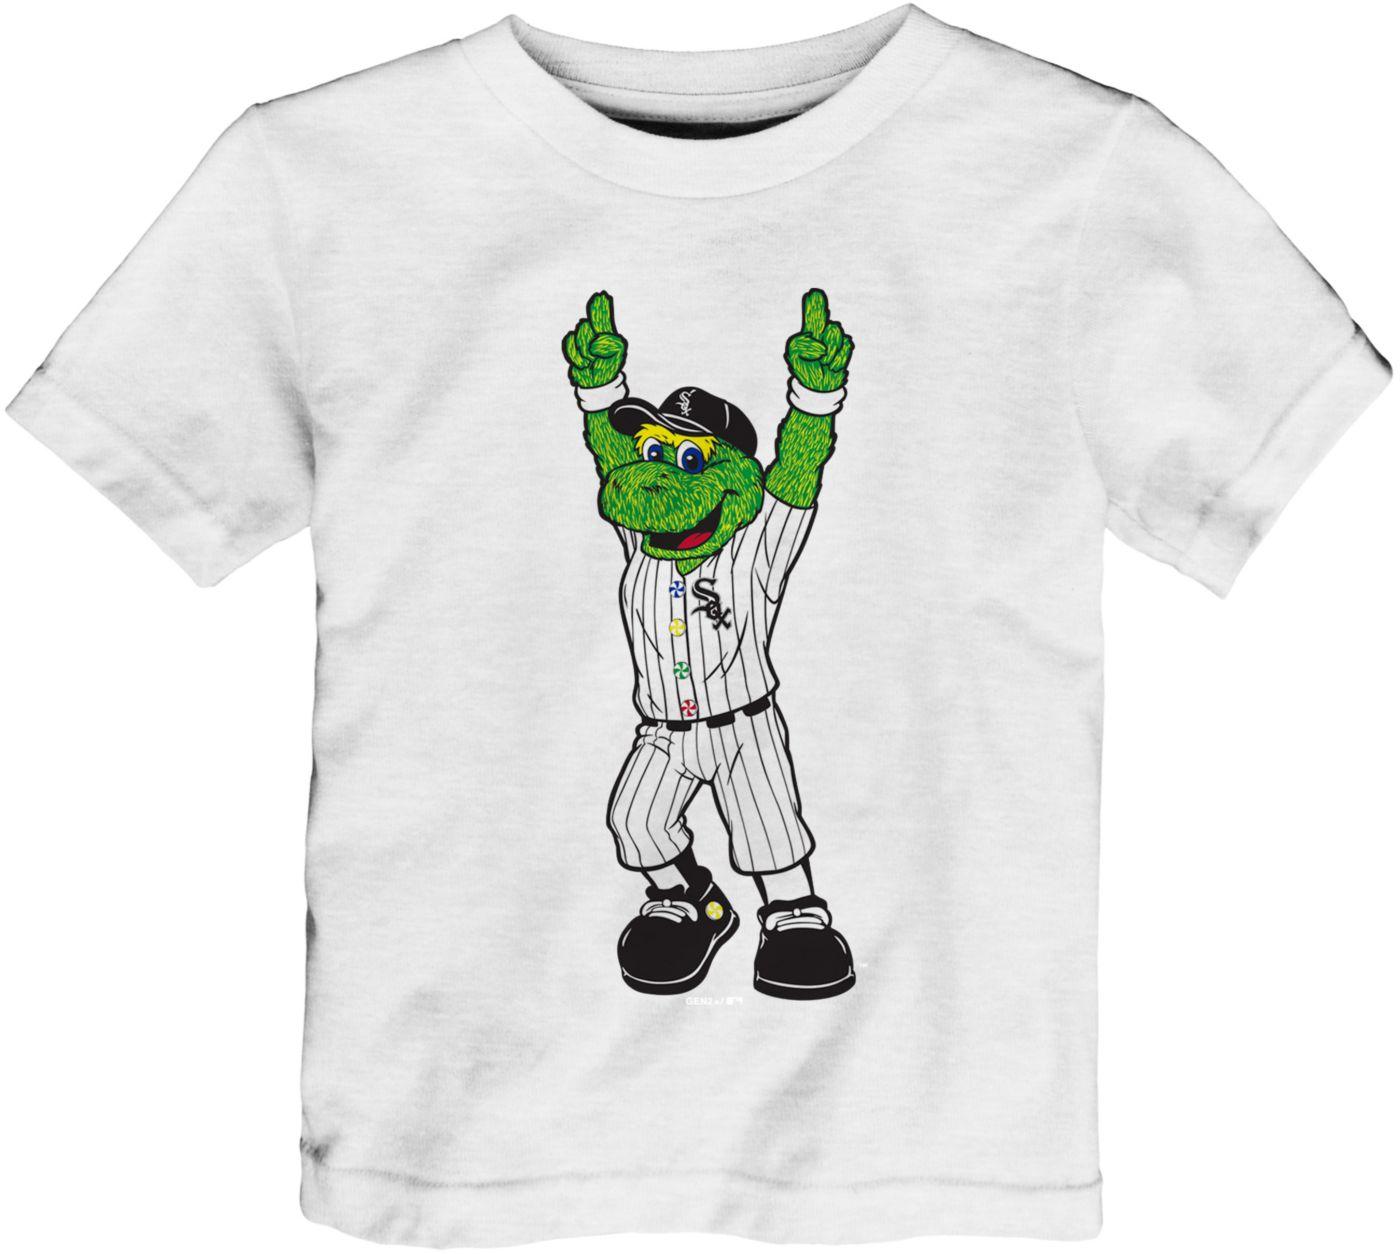 Gen2 Toddler Chicago White Sox Mascot T-Shirt